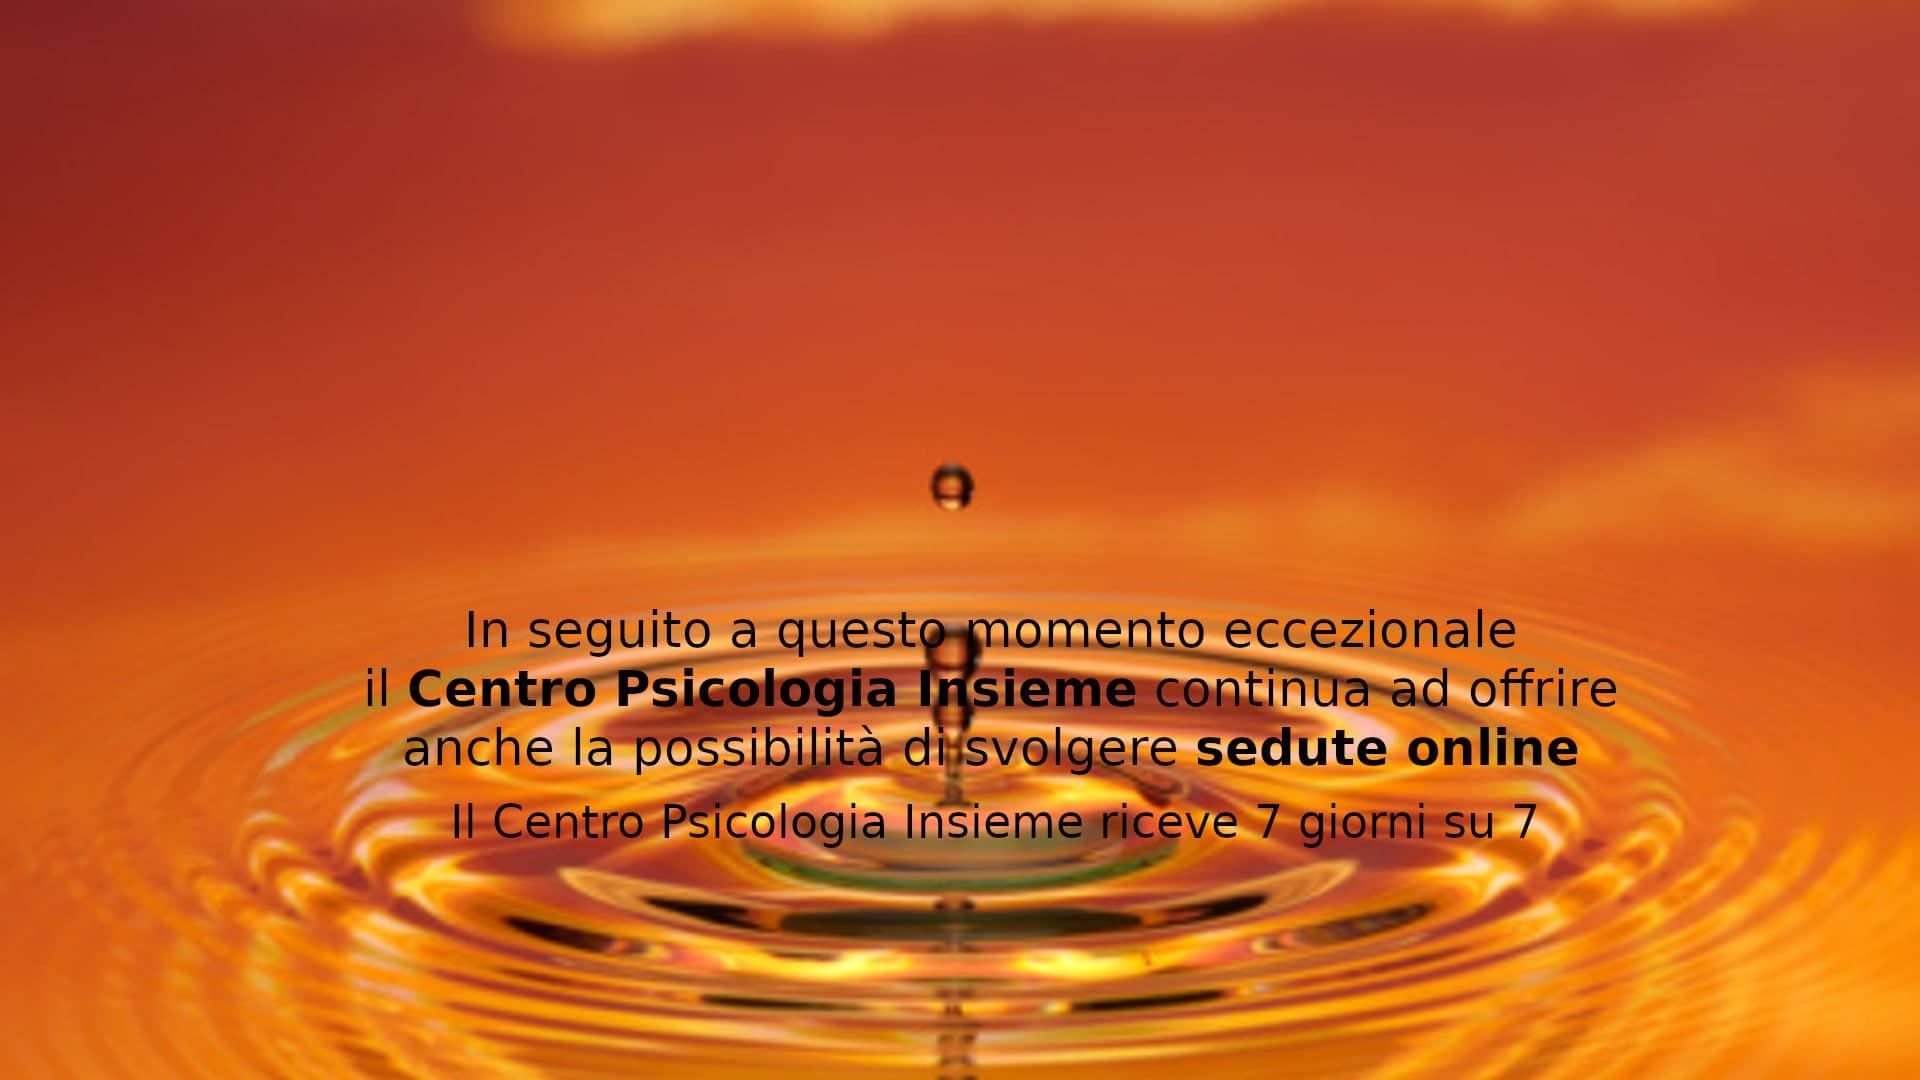 Centro Psicologia Insieme